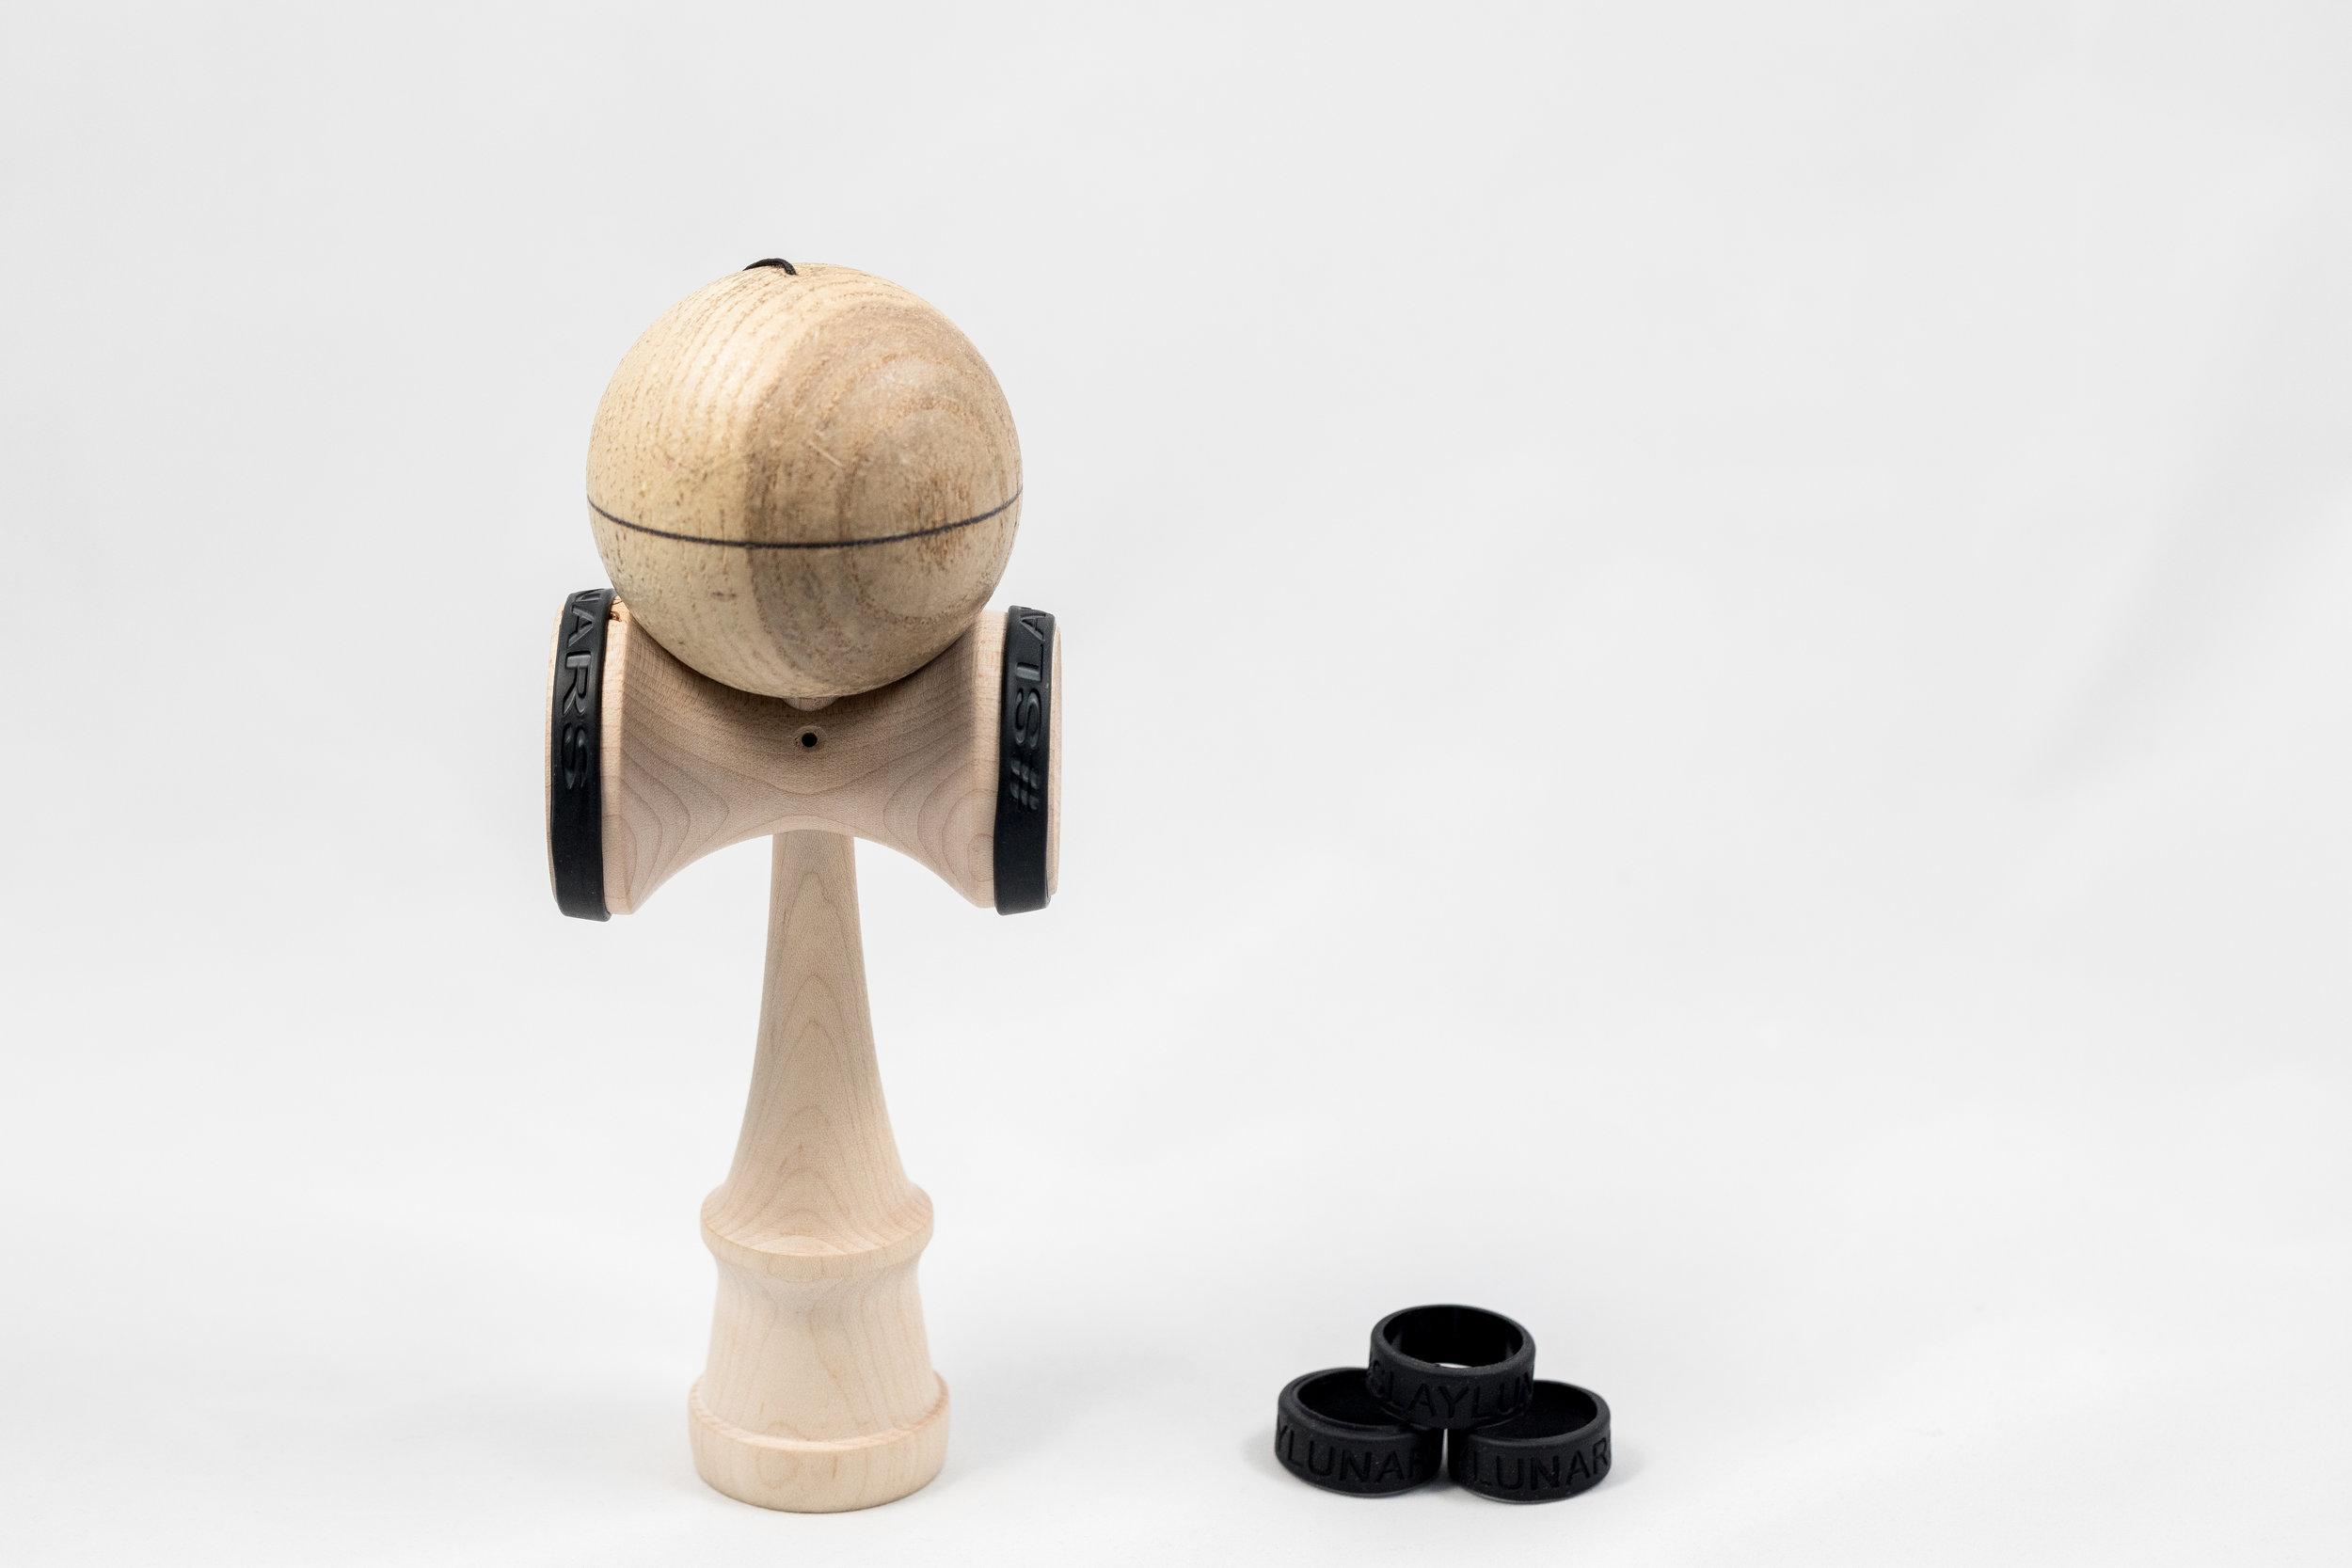 kendama-accessory-band-weight-lunars